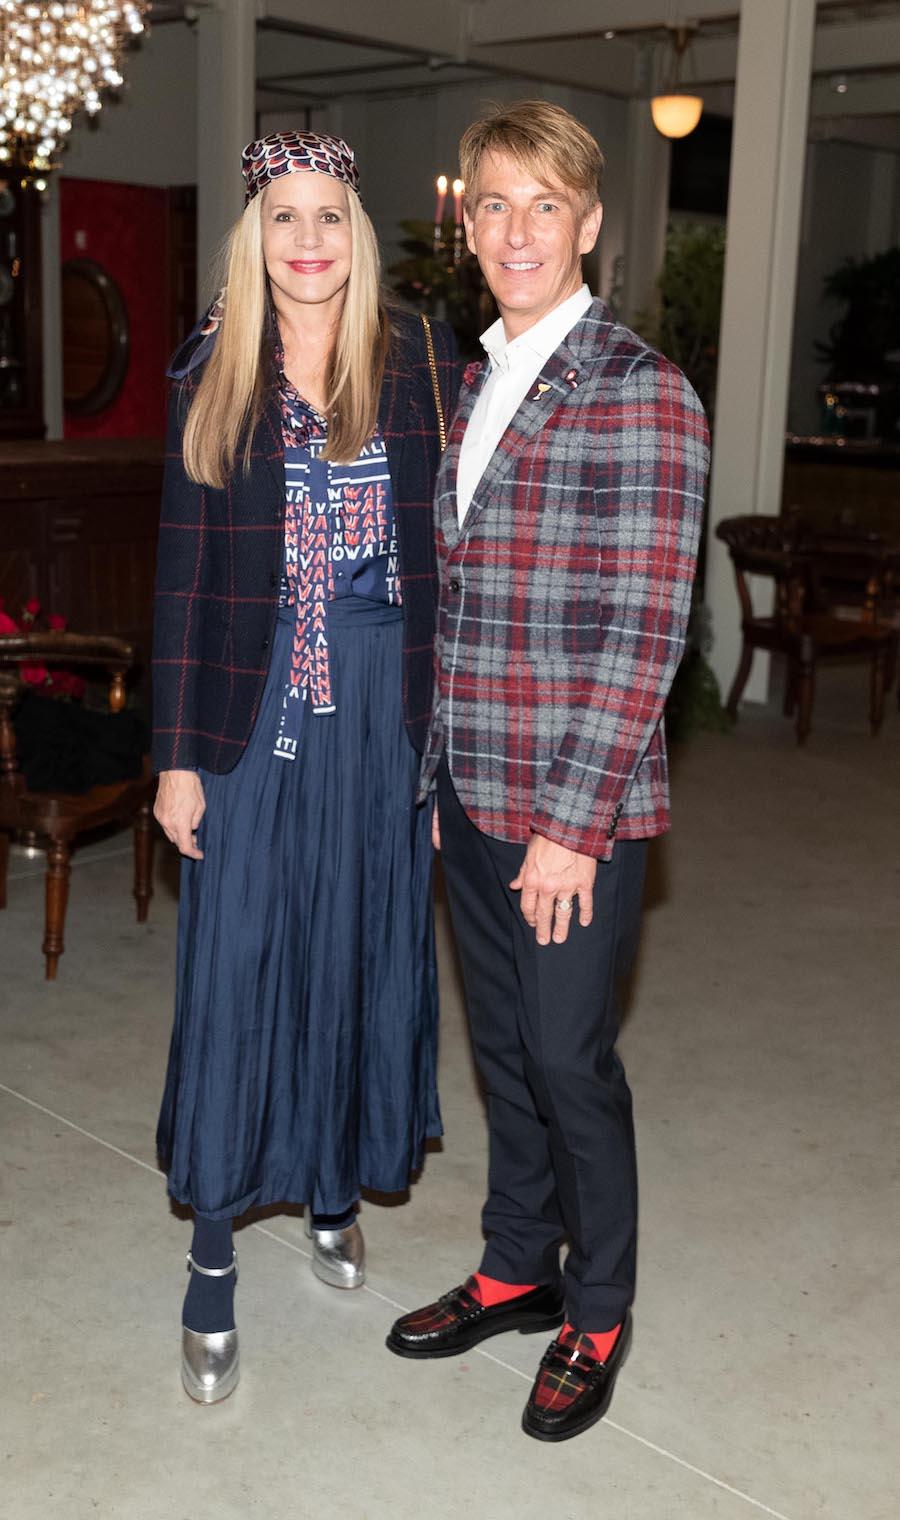 Marybeth Shimmon and Jack Calhoun